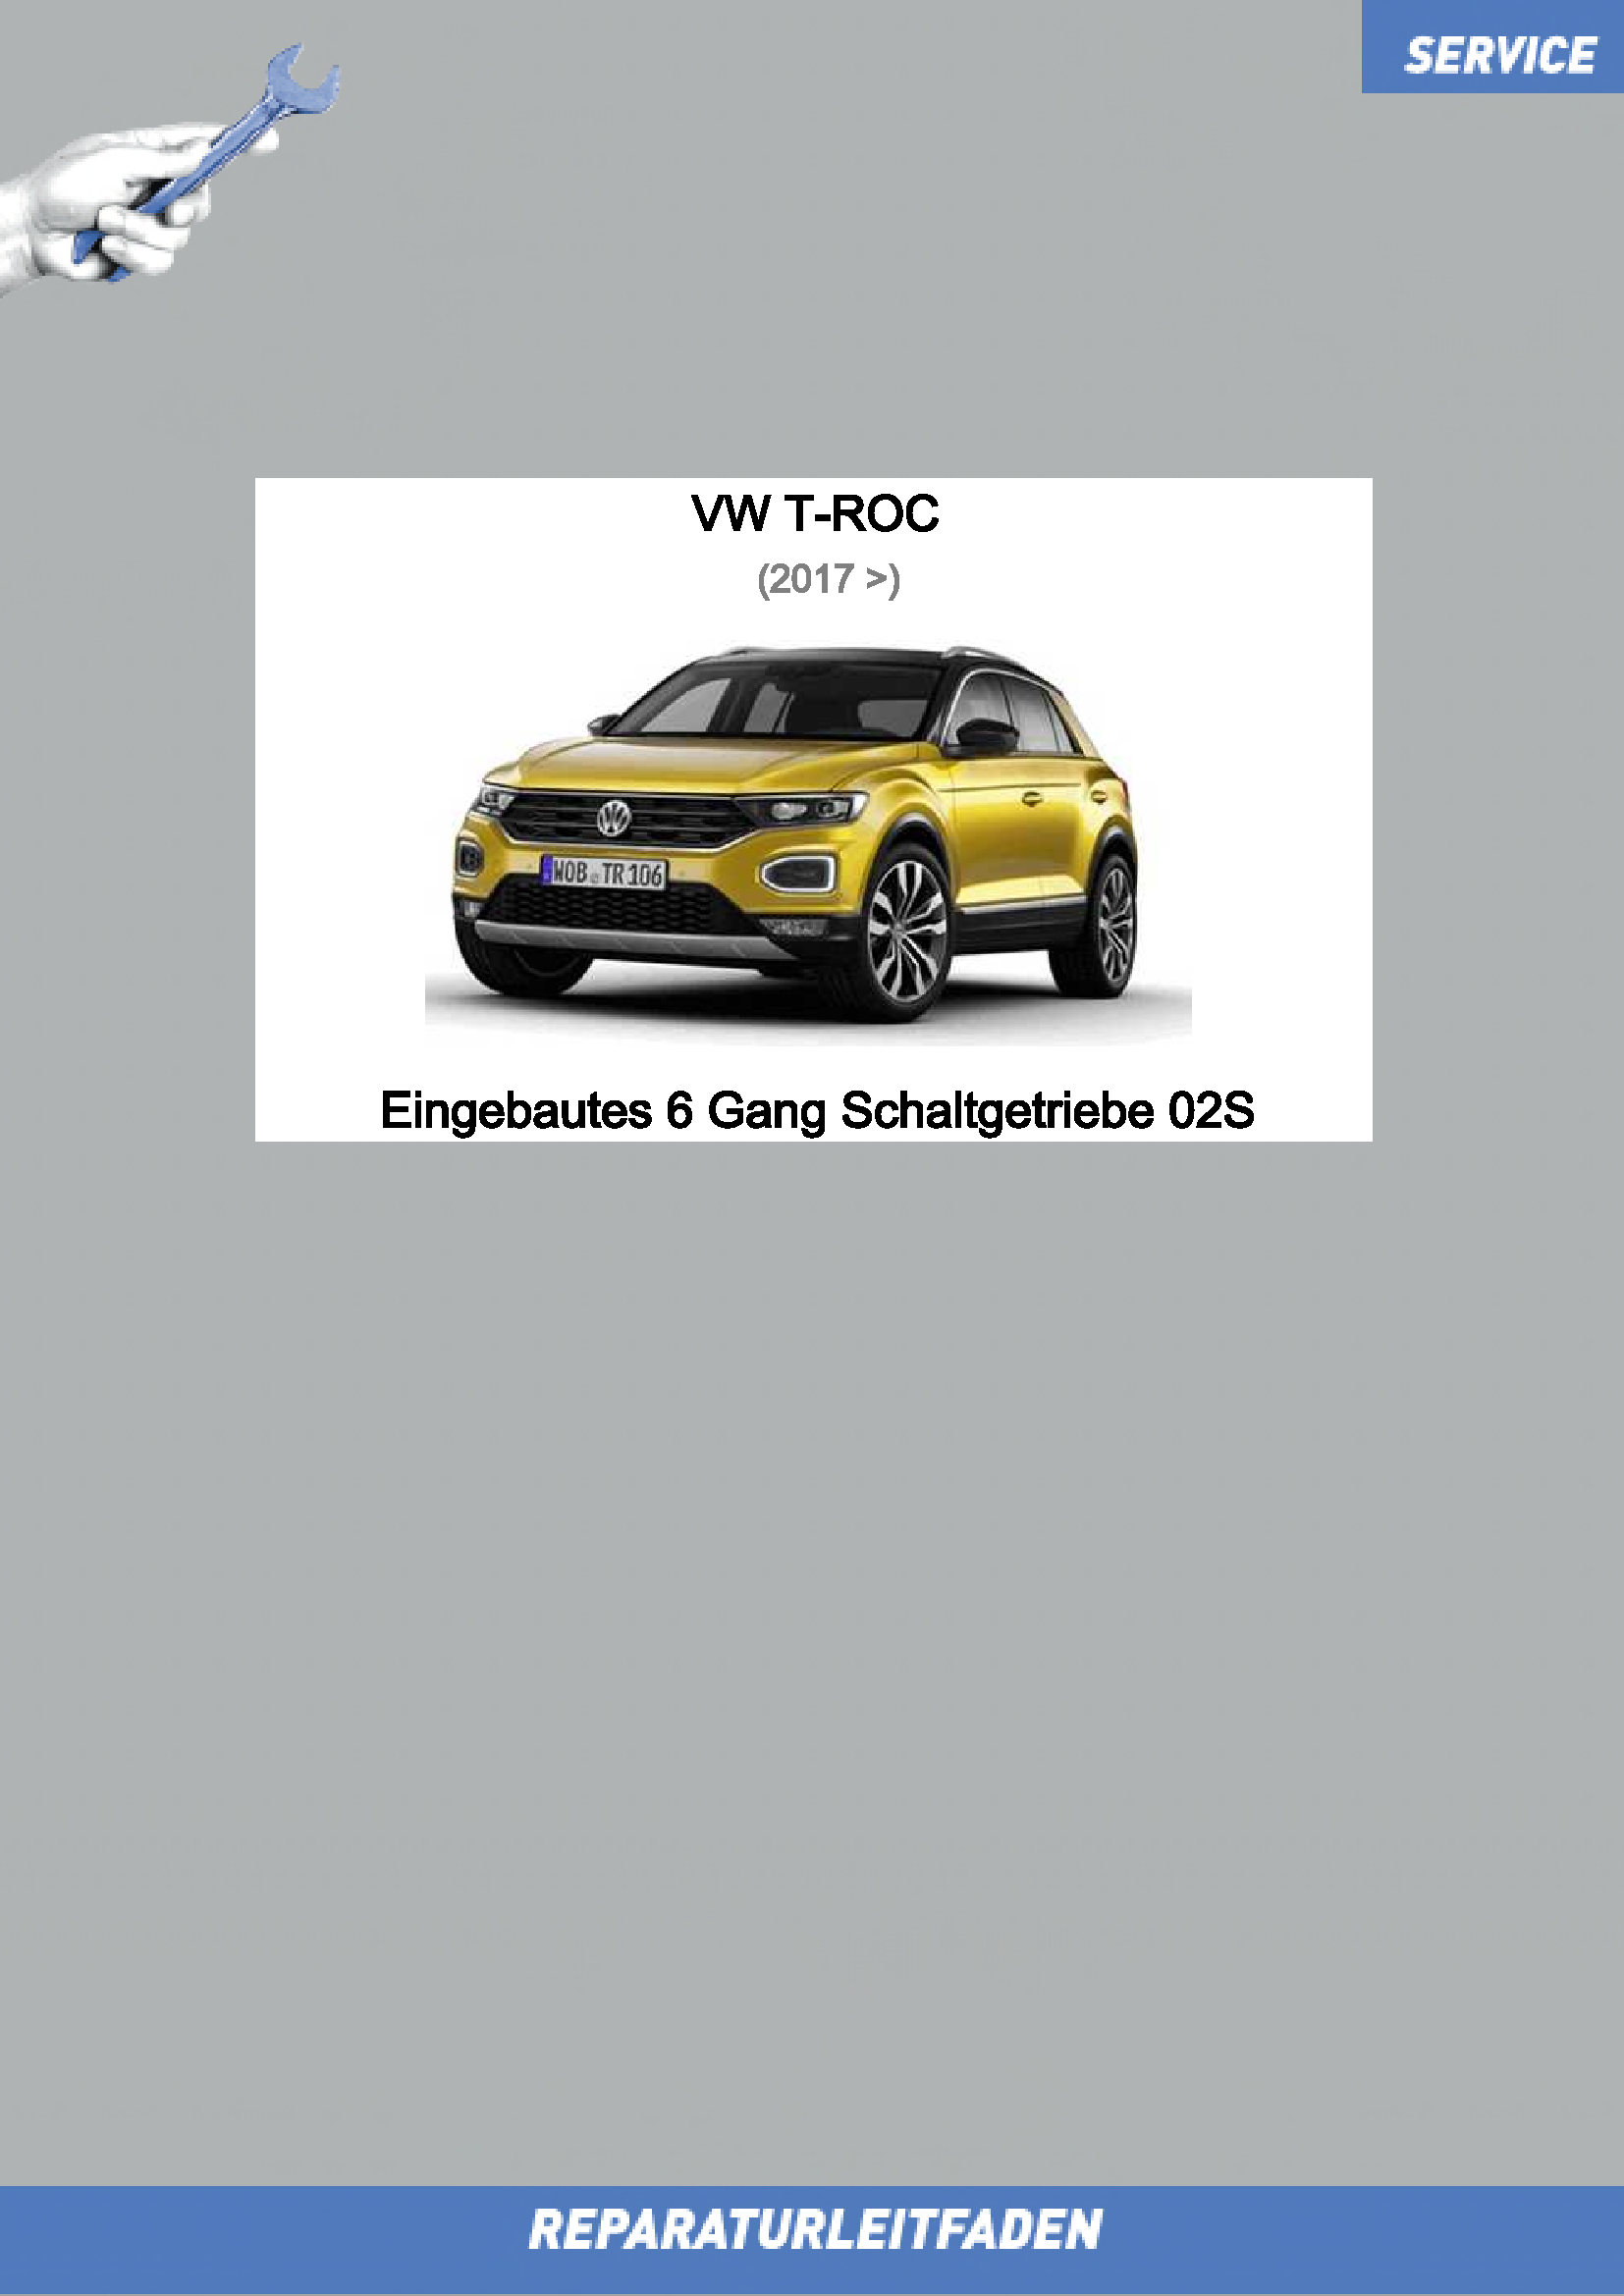 vw-t-roc-0021-eingebautes_6_gang_schaltgetriebe_02s_1.png